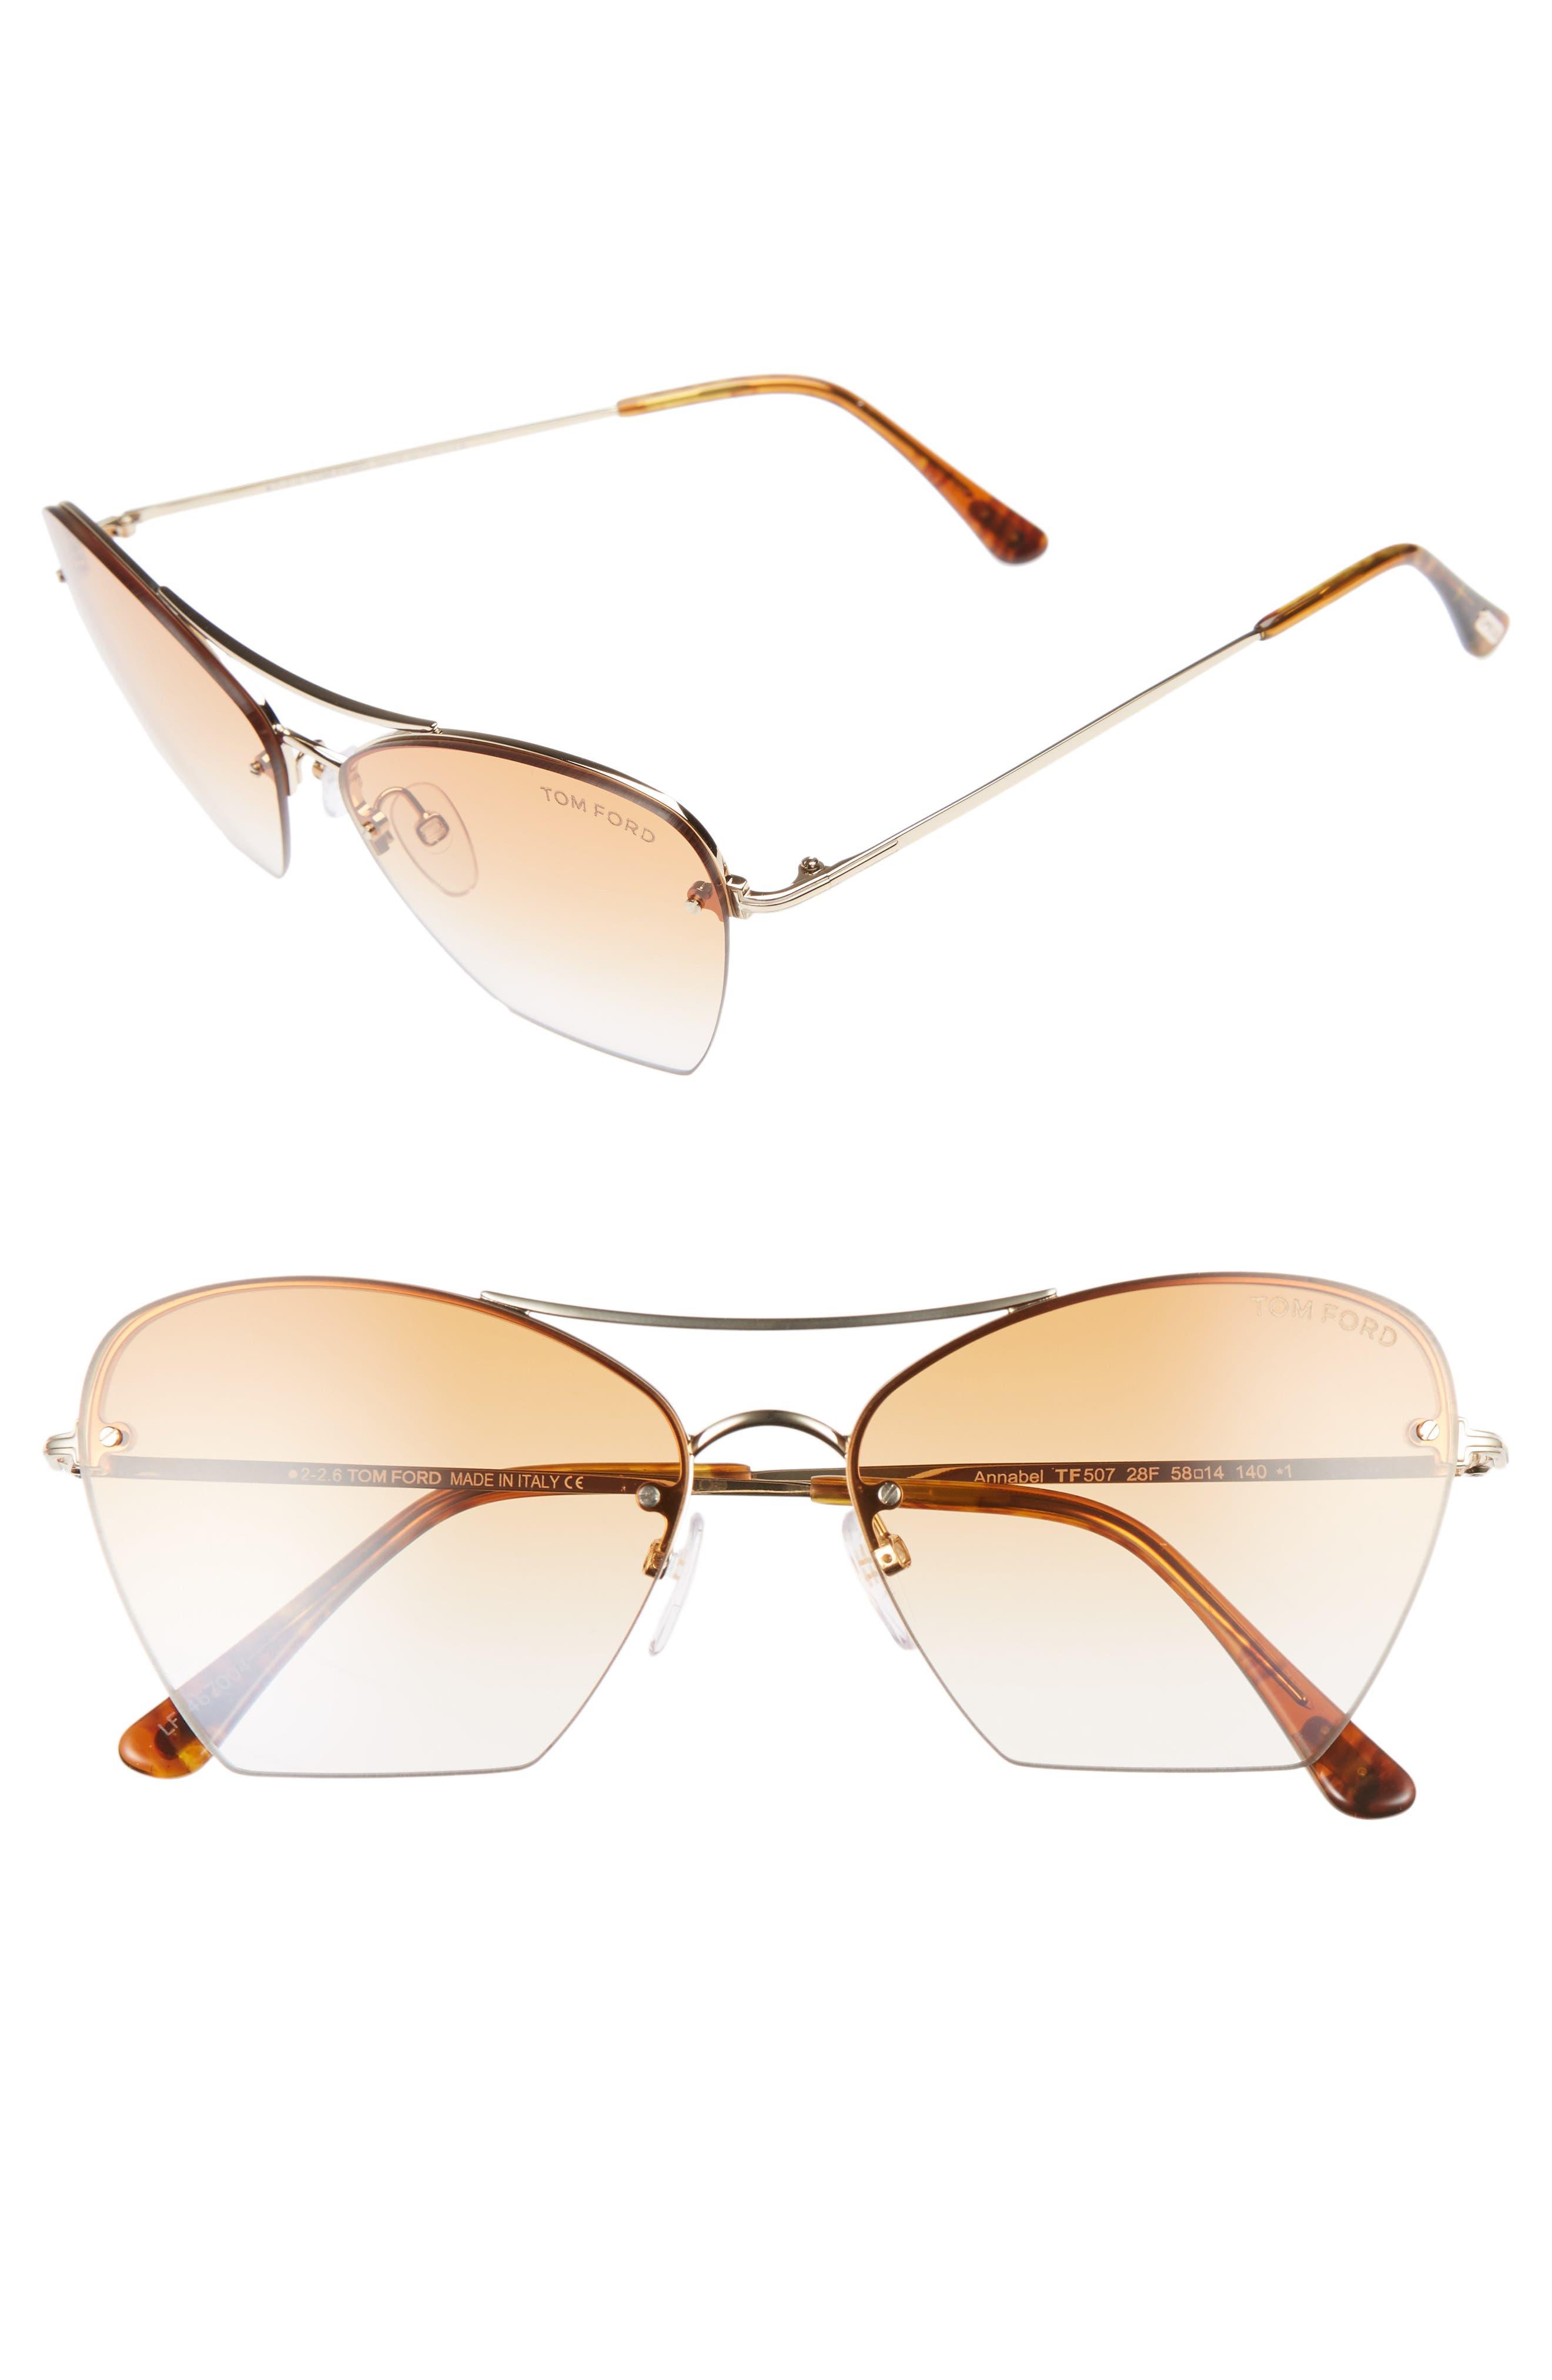 Annabel 58mm Cat Eye Sunglasses,                         Main,                         color, Rose Gold/ Yellow/ Yellow